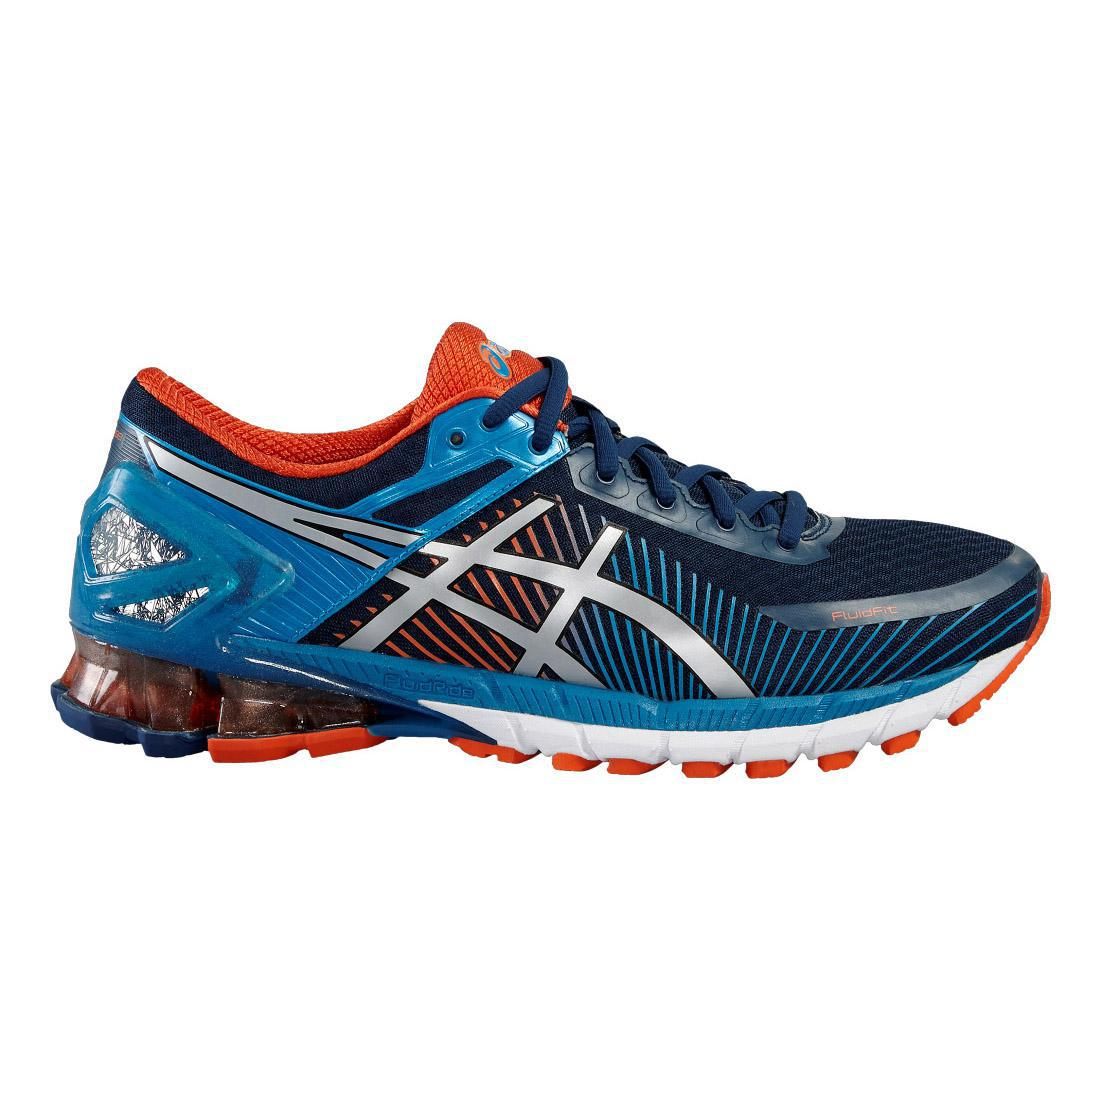 c9504a2e025 Asics Mens GEL-Kinsei 6 Running Shoes - Blue Orange - Tennisnuts.com